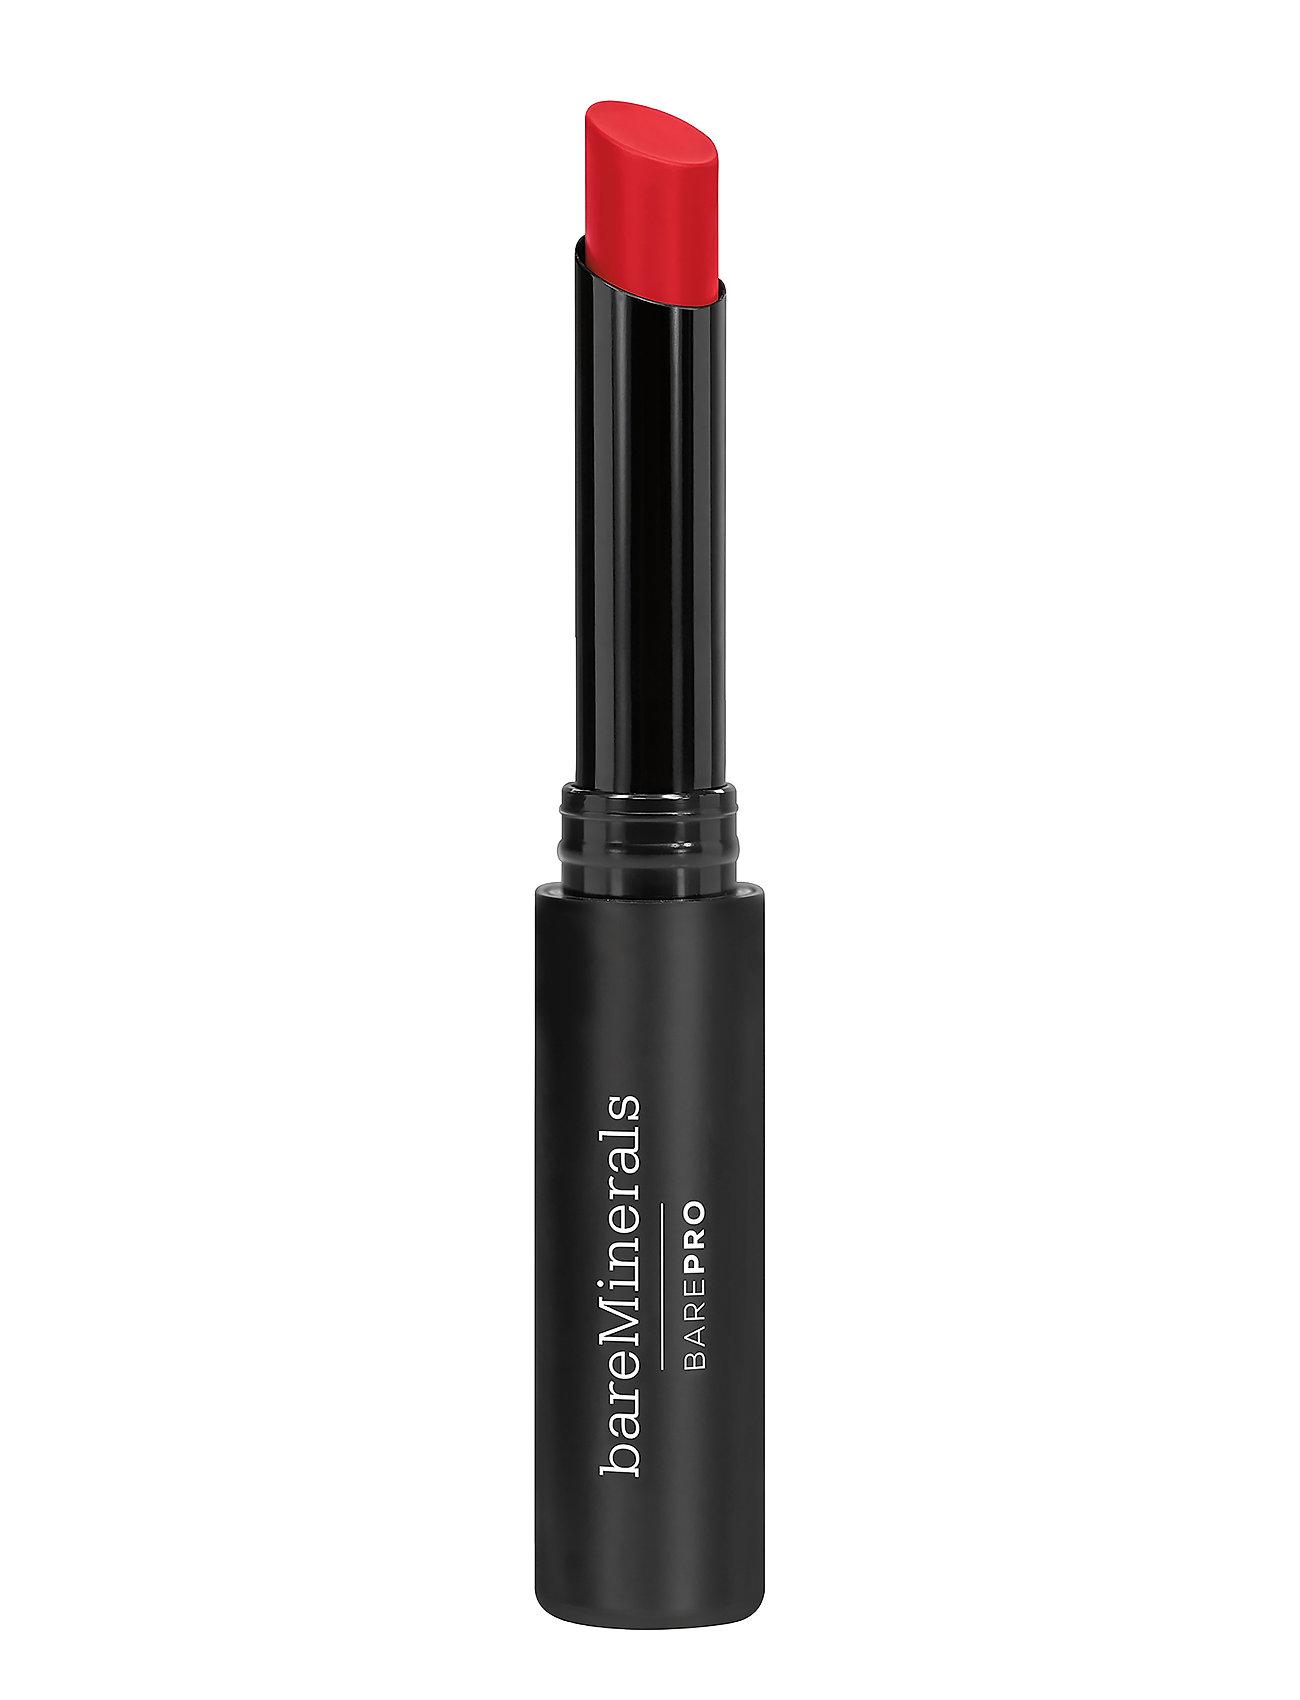 Image of Barepro Longwear Lipstick Cherry Læbestift Makeup Rød BareMinerals (3138616975)